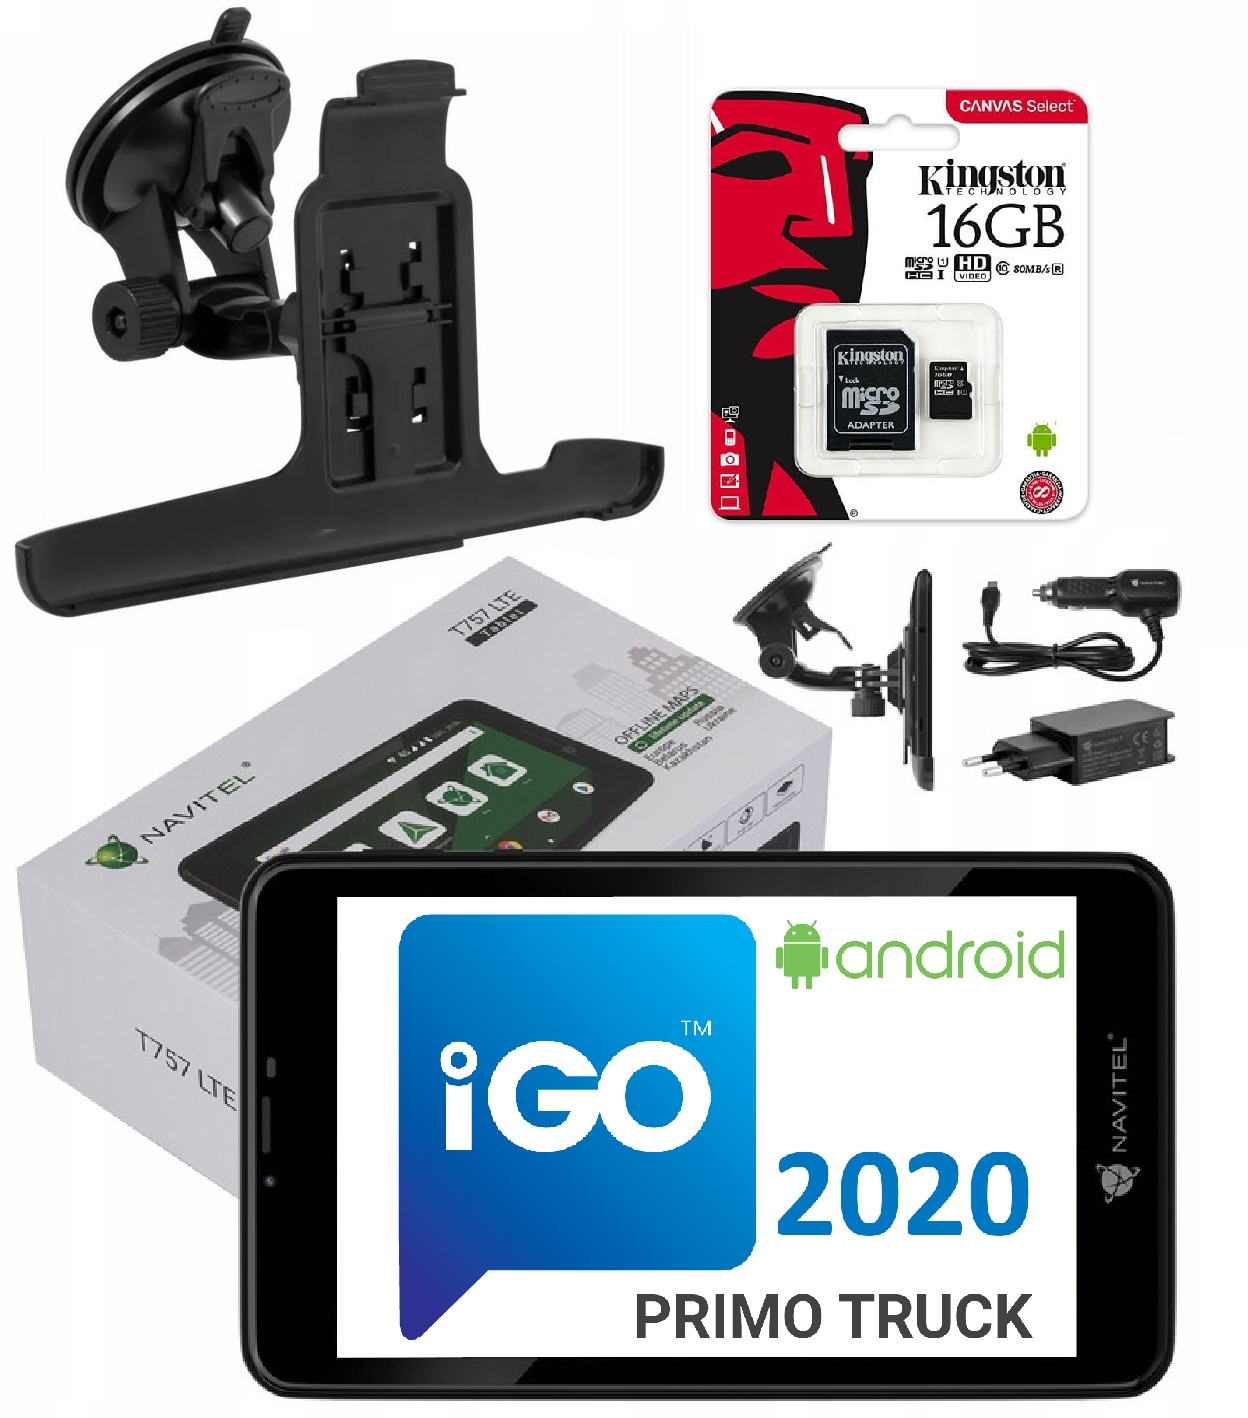 IGO PRIMO Грузовик Навител T757 Android GPS-навигация